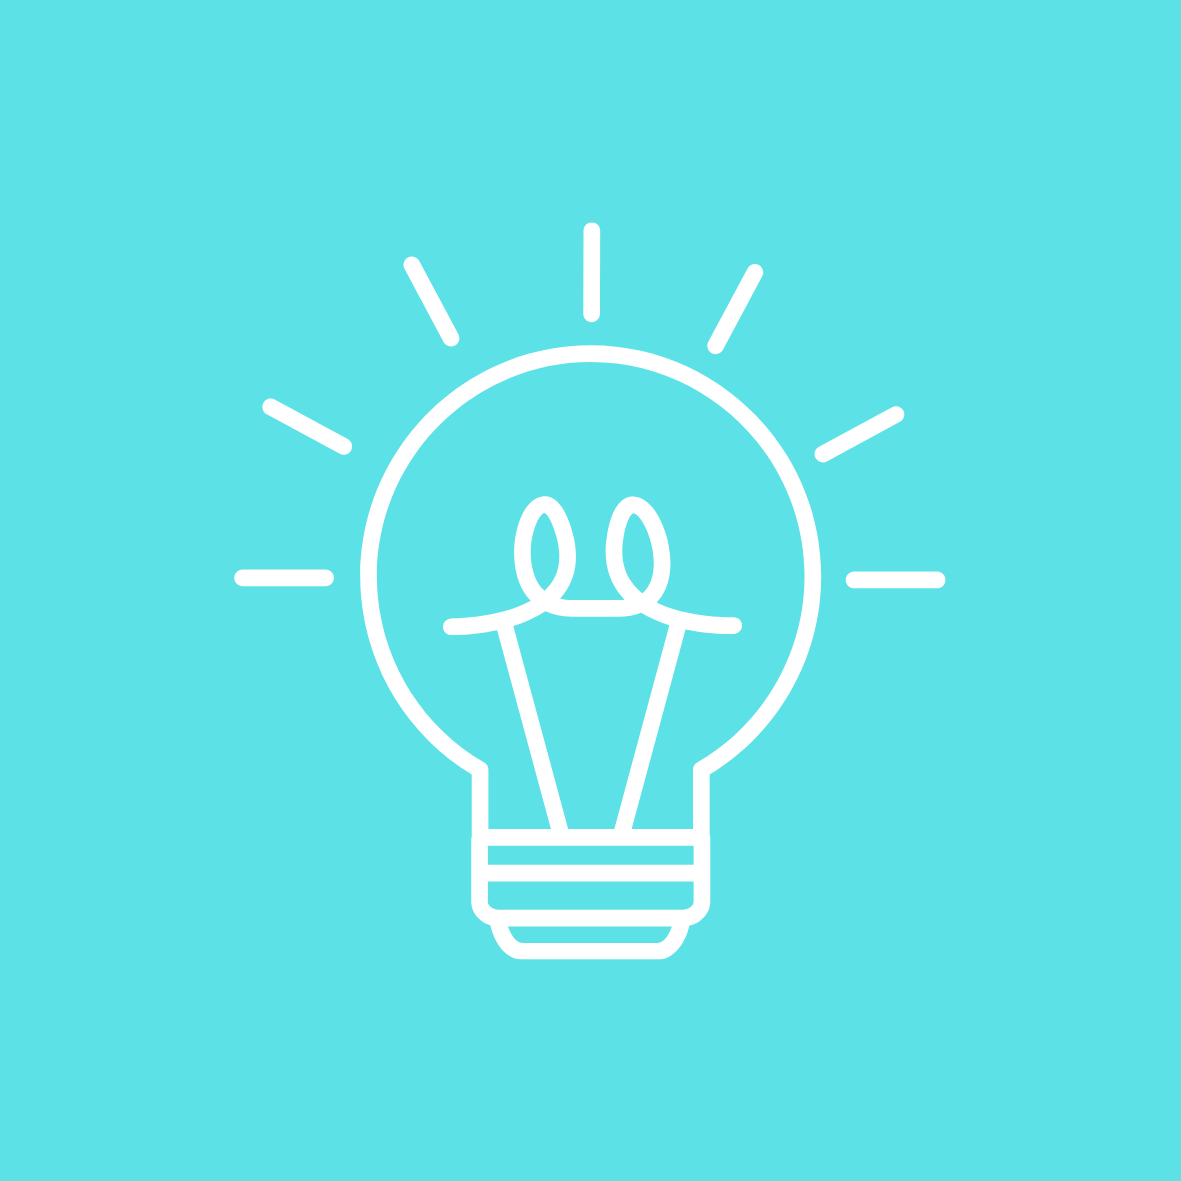 FMLAS Pillar 2. Minimalist cartoon of a lightbulb shining